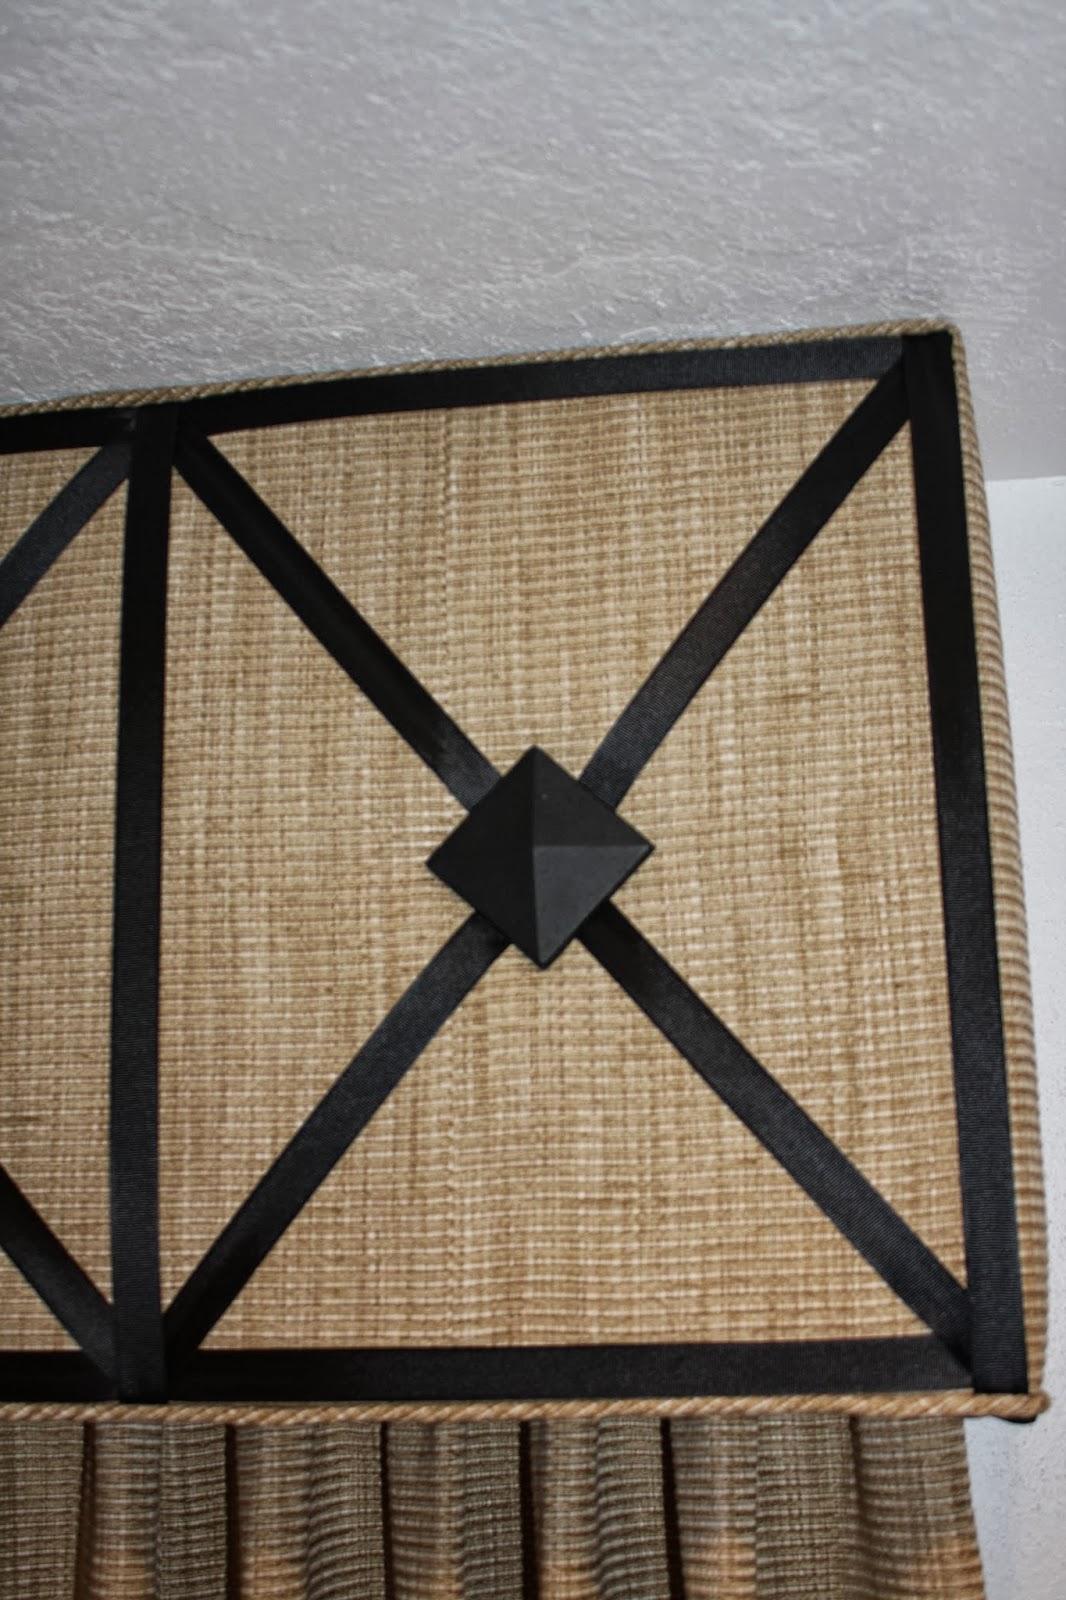 Wrought Iron Cornice : Window fashions cornice board using wrought iron medallions